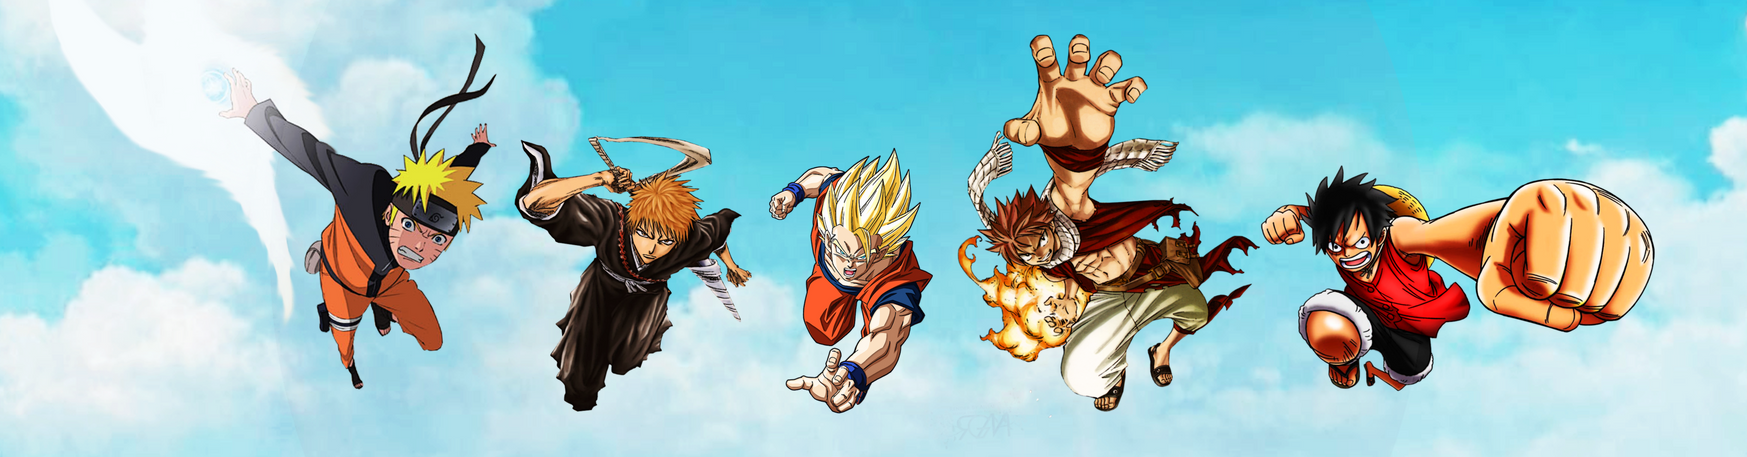 Anime Crossover by LegendaryRey